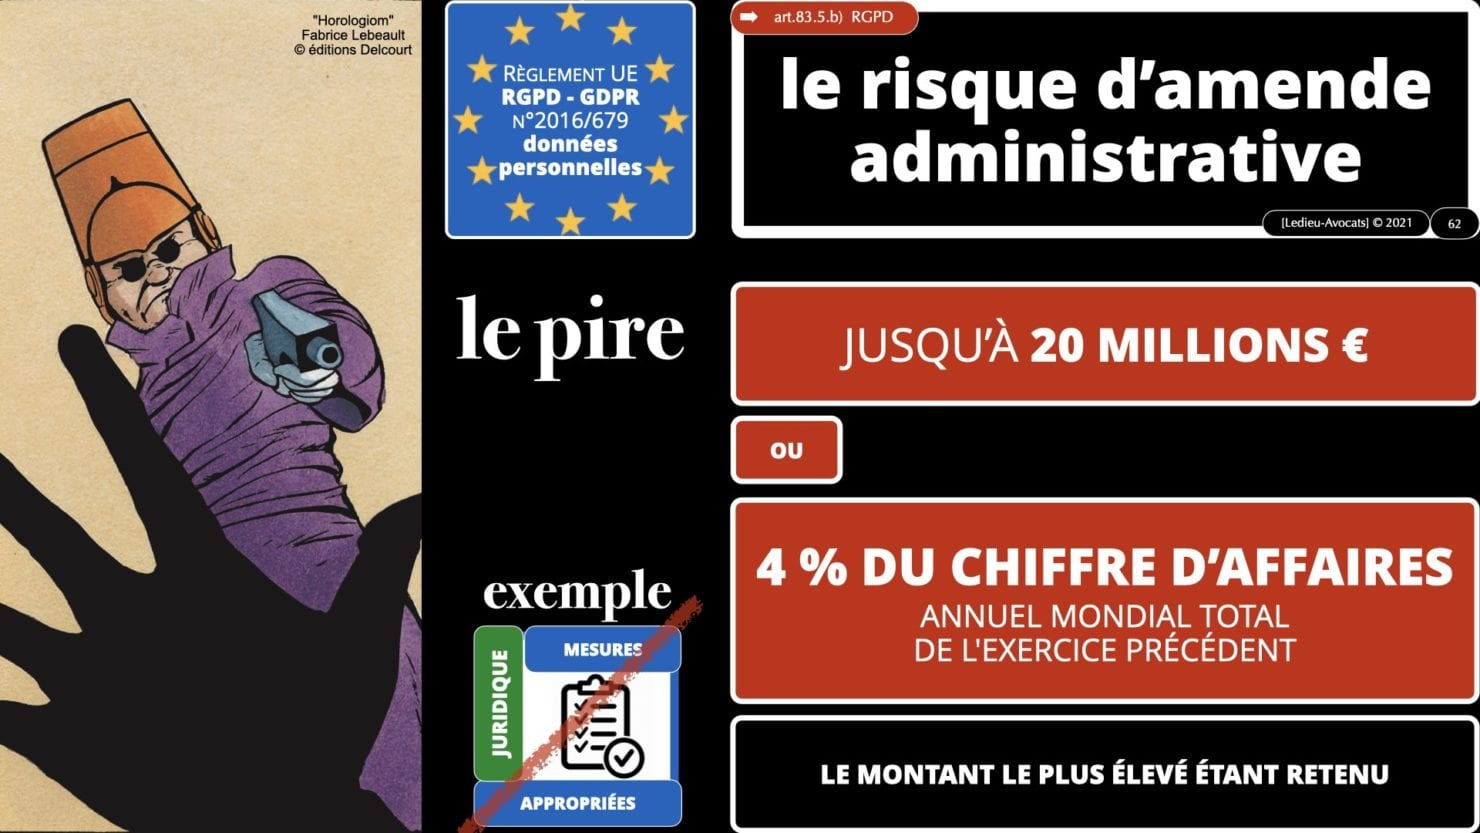 RGPD e-Privacy principes actualité jurisprudence ©Ledieu-Avocats 25-06-2021.062